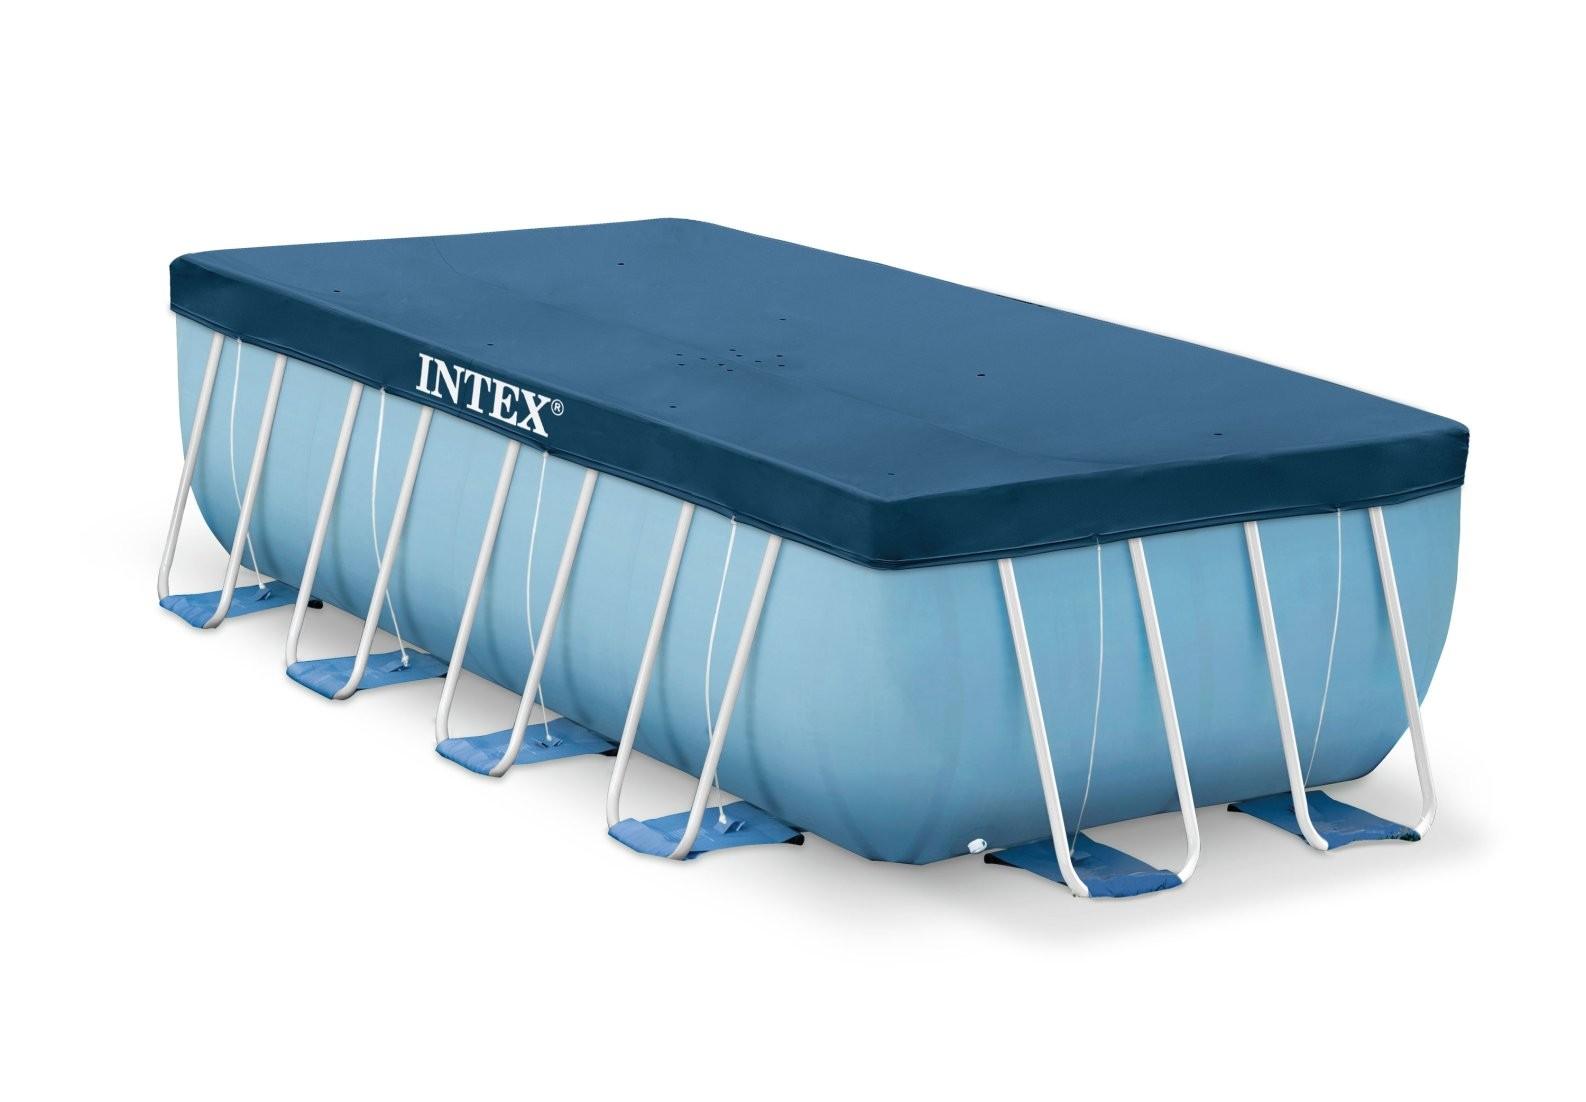 Intex 28037 telo piscina 400 x 200 cm - Telo copertura piscina intex ...